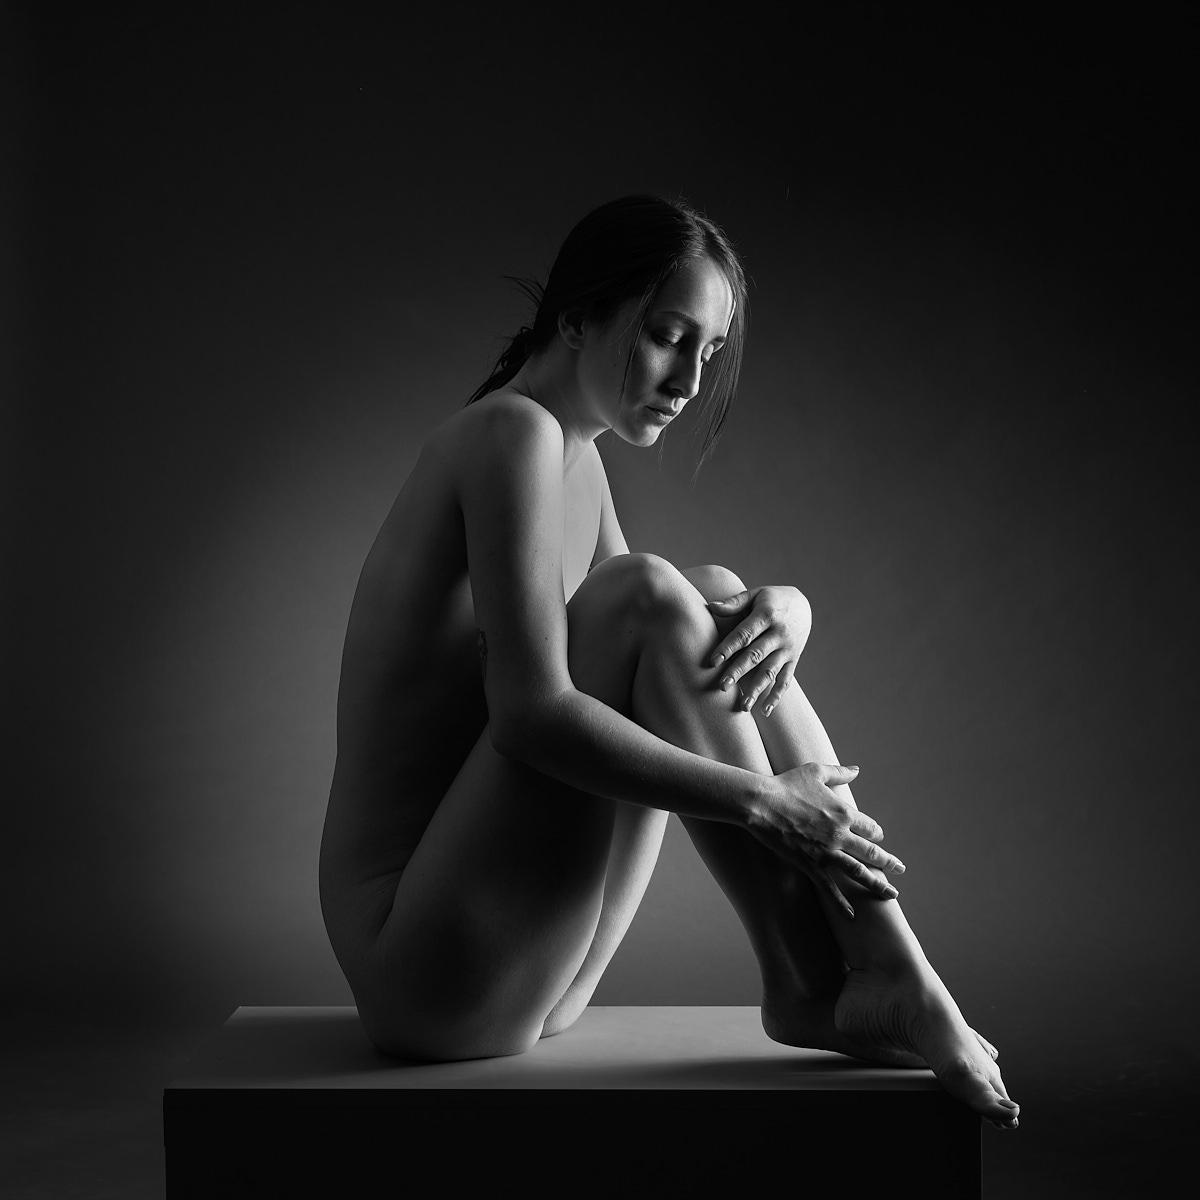 Femme assise noir et blanc